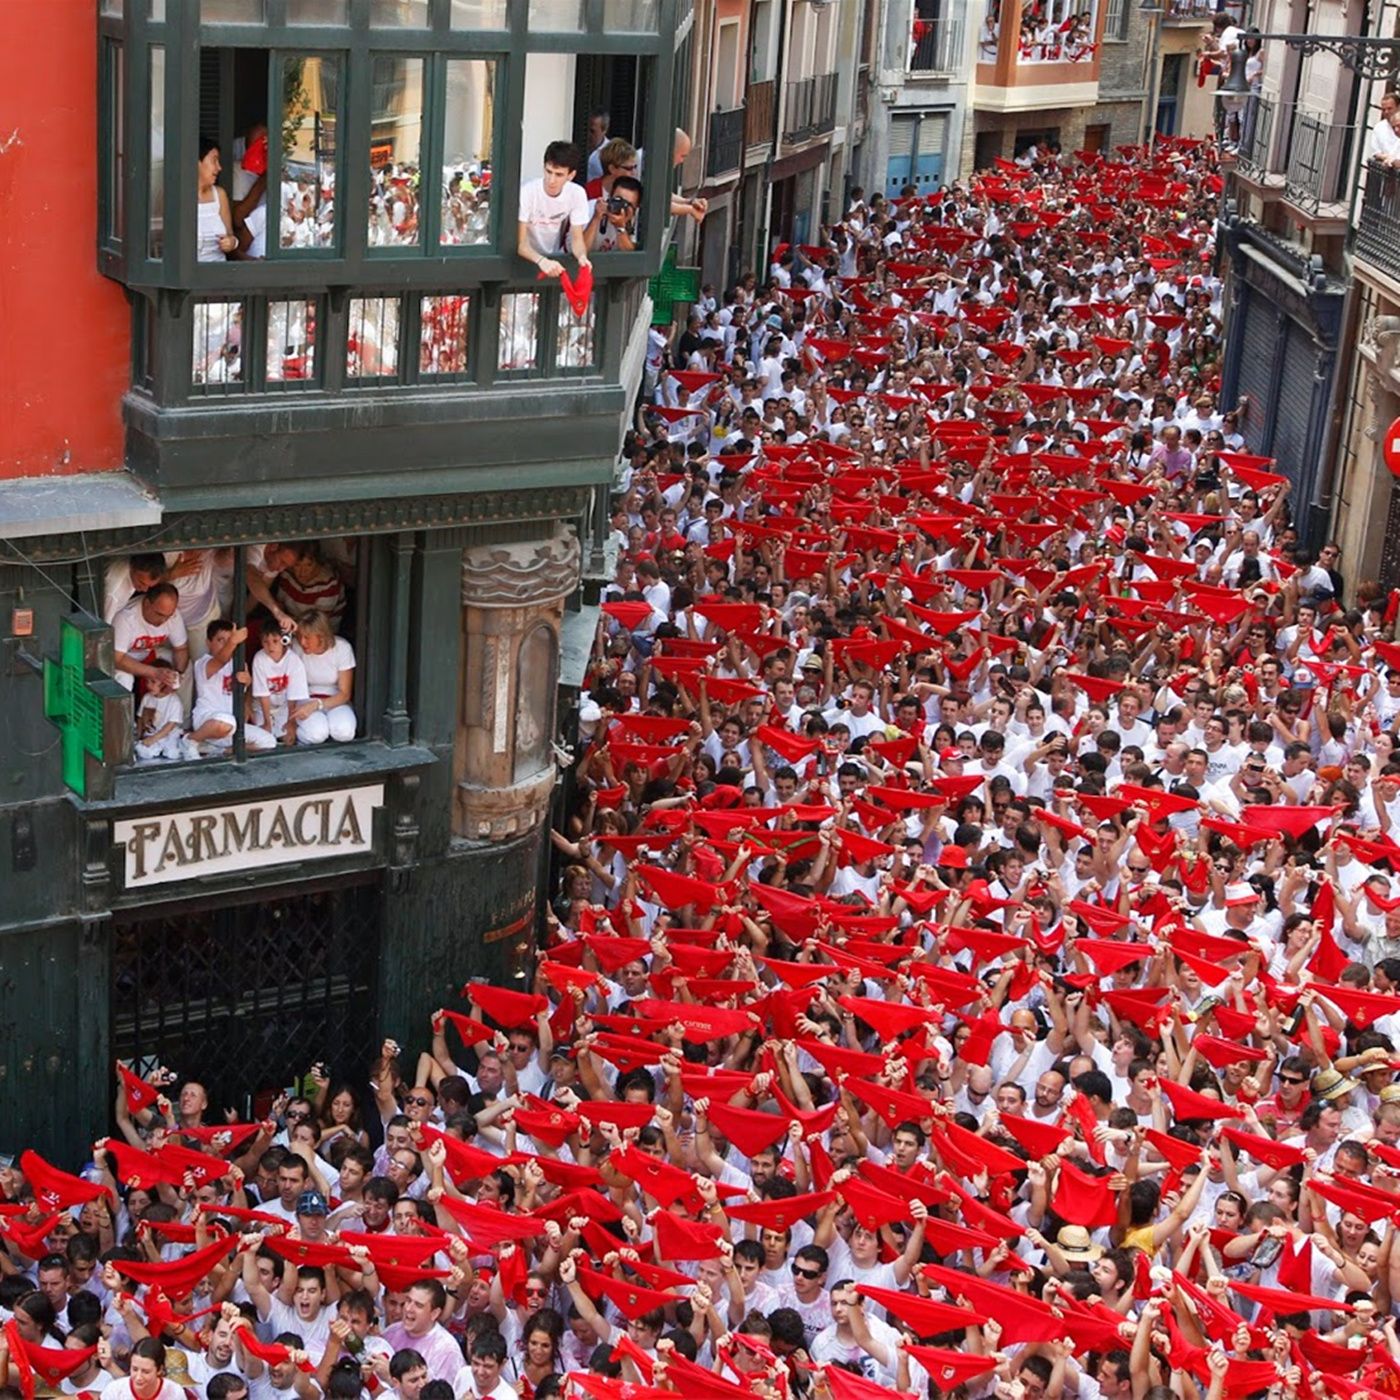 ¡A celebrar! 西班牙节庆